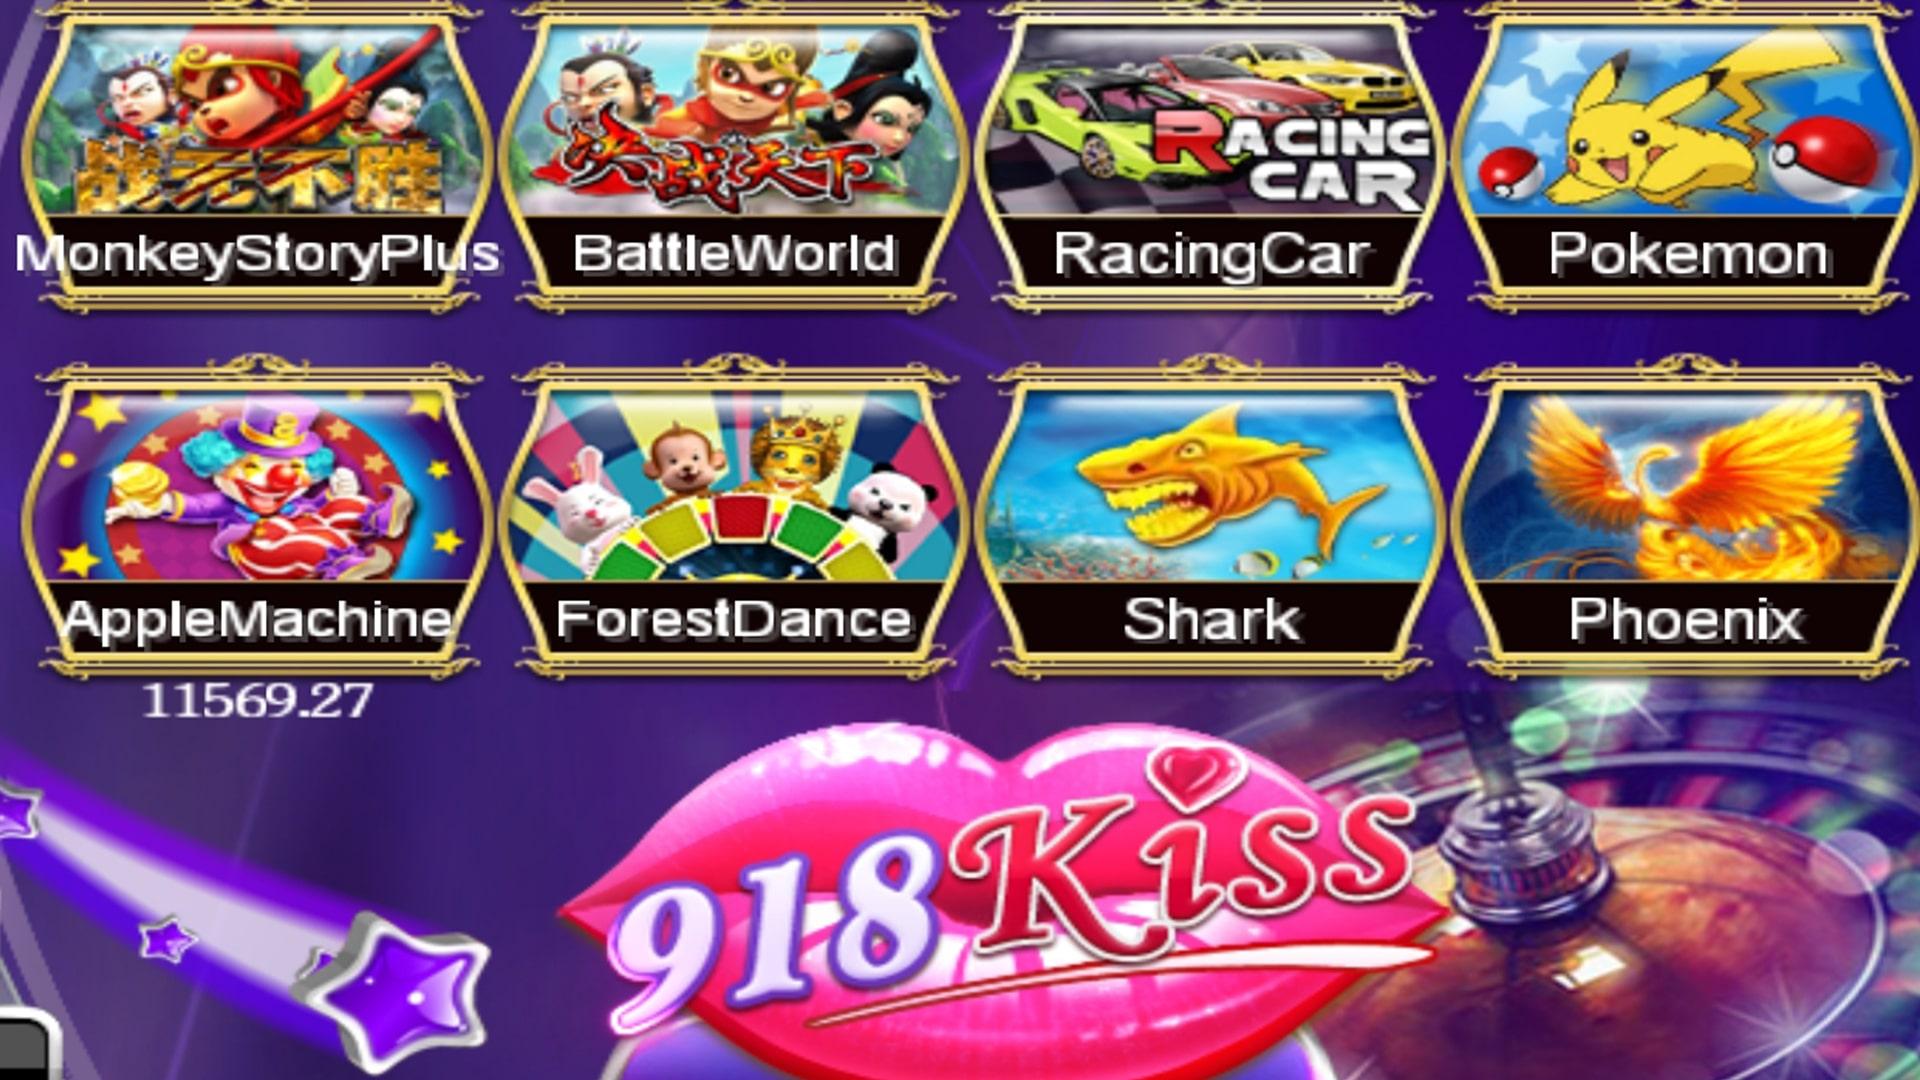 918kiss Apk Downloads – A Closer Look At The Popular Apk Software